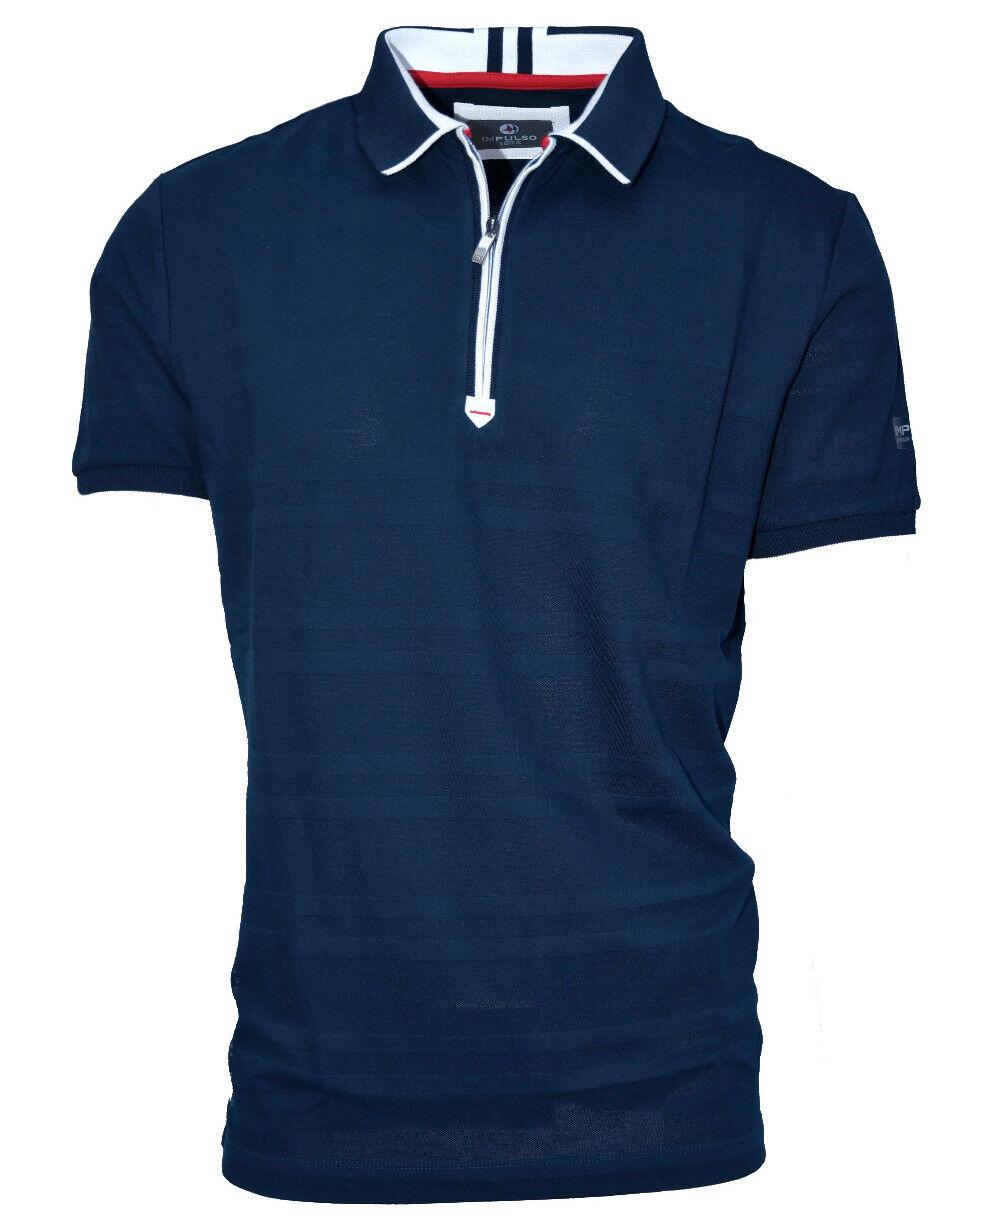 Poloshirt Impulso  Strukturstreifen dunkelblau weiss weiss weiss mit Zipper Gr. M-3XL   Schön  71df32